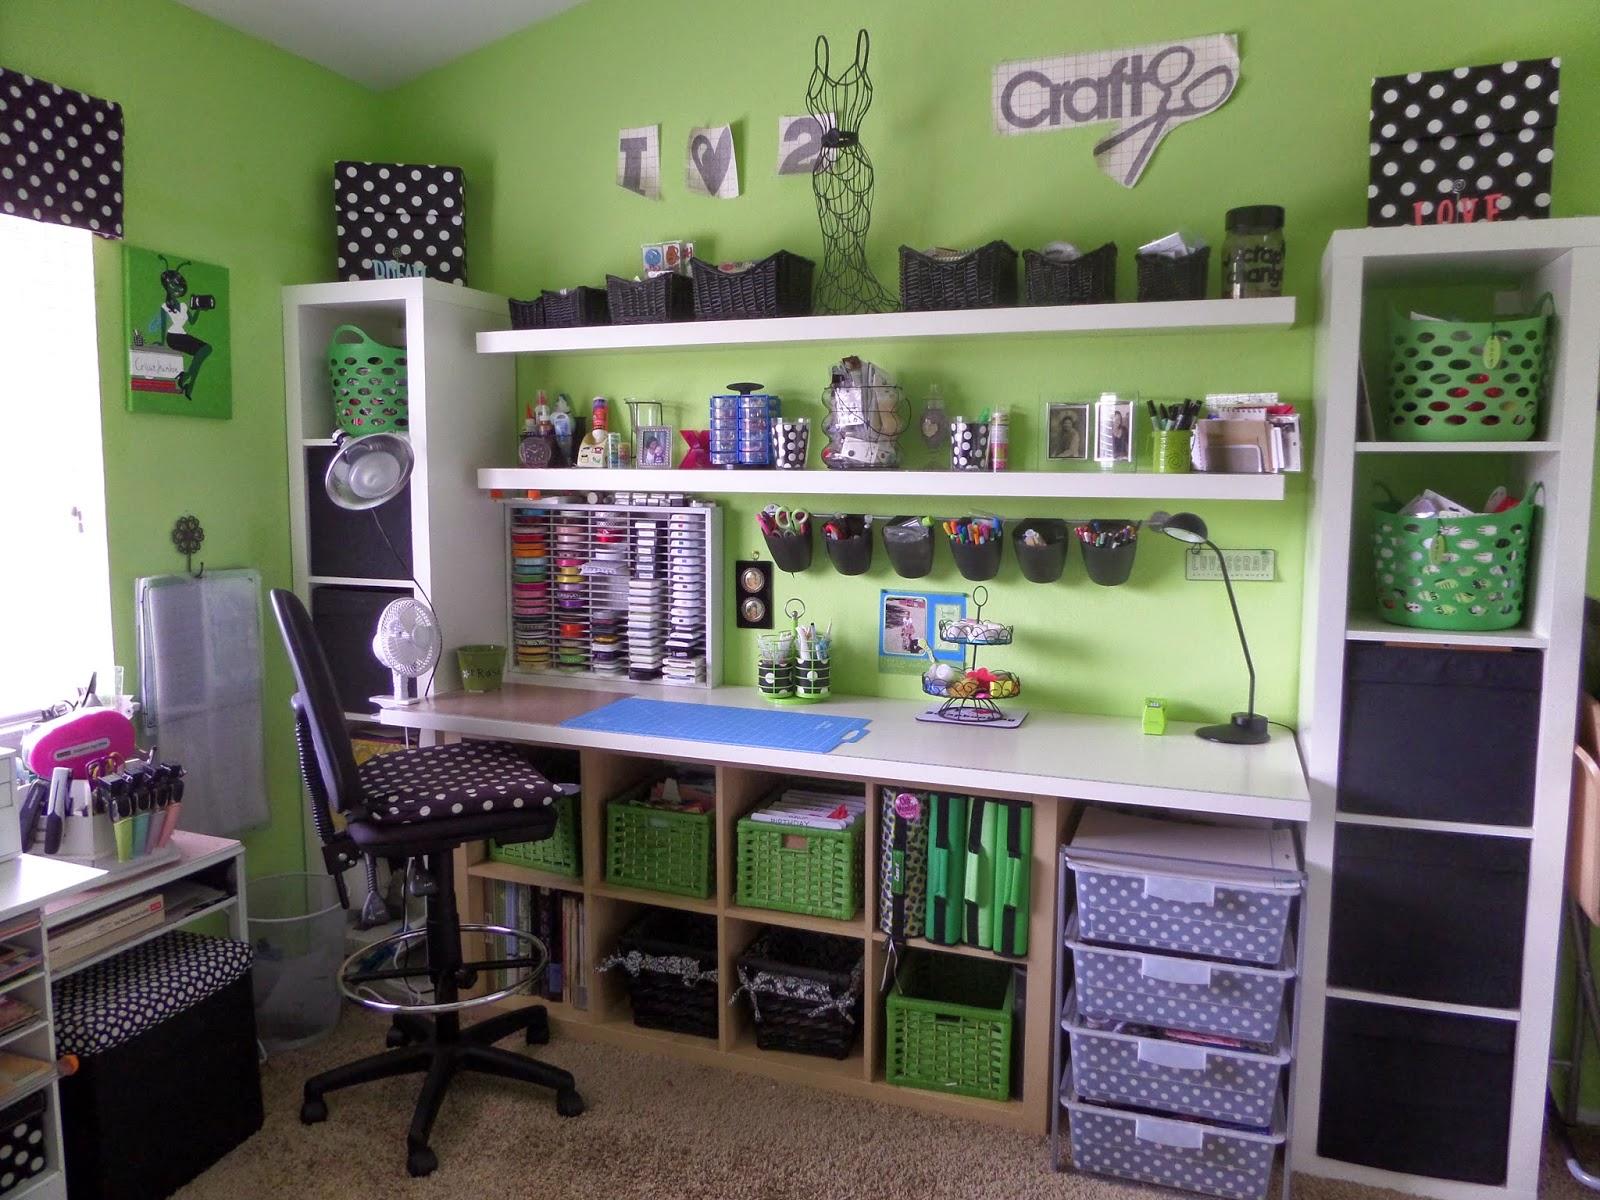 Cricutjunkie Craft Room Makeover Part 1